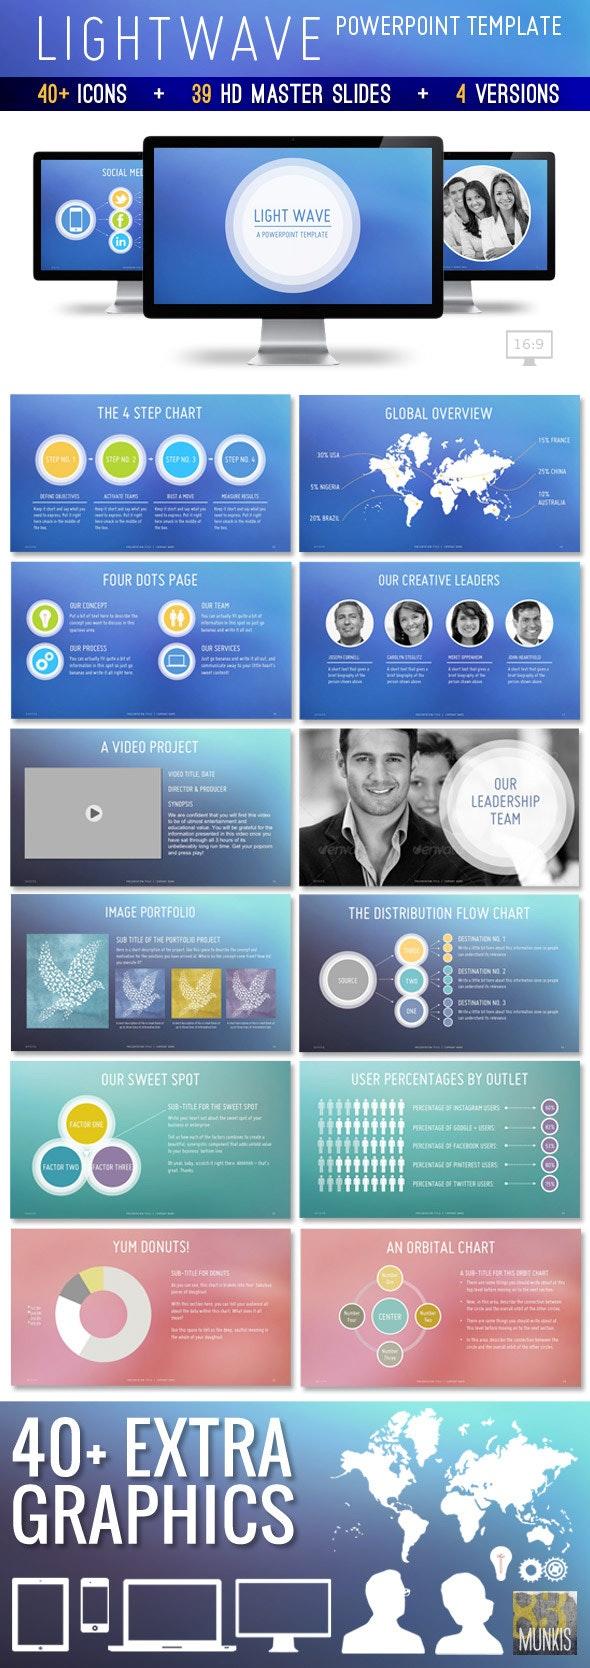 Lightwave Powerpoint Template - Business PowerPoint Templates